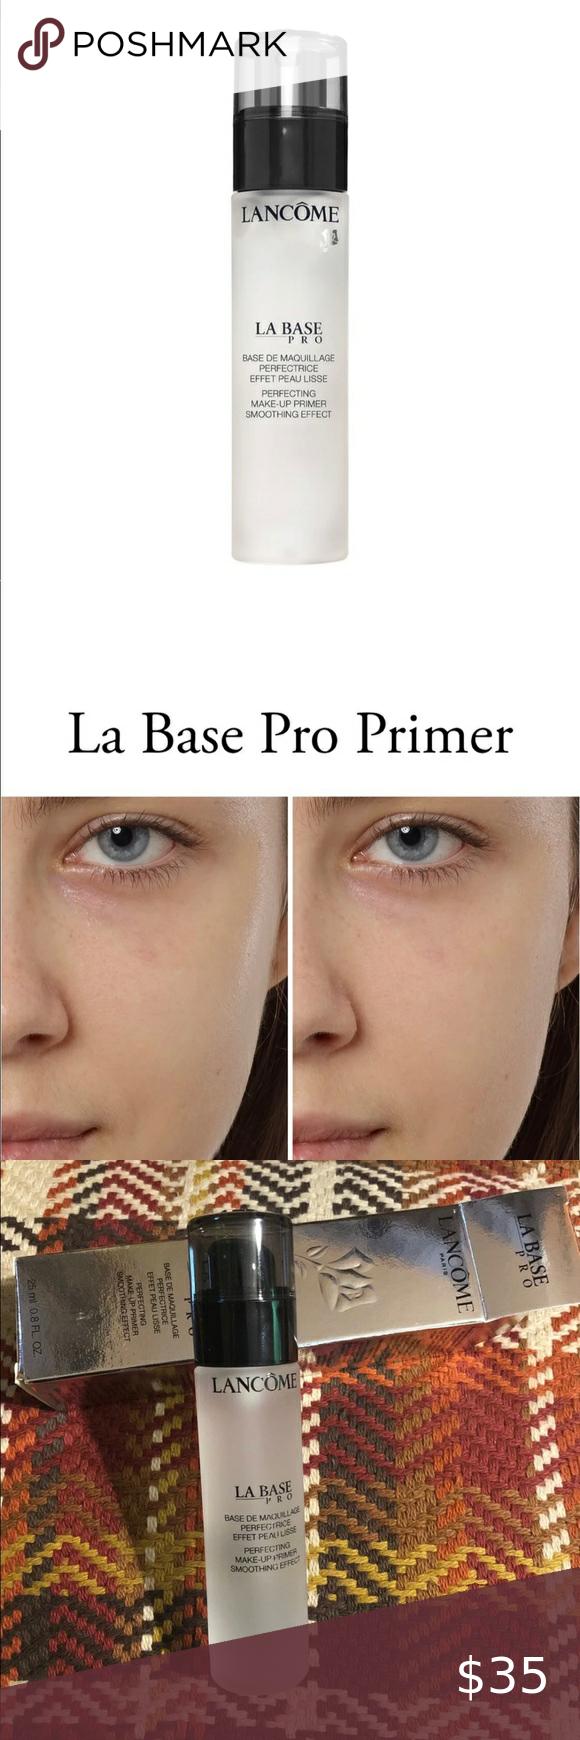 Lancôme La Base Pro Perfecting Makeup in 2020 Makeup